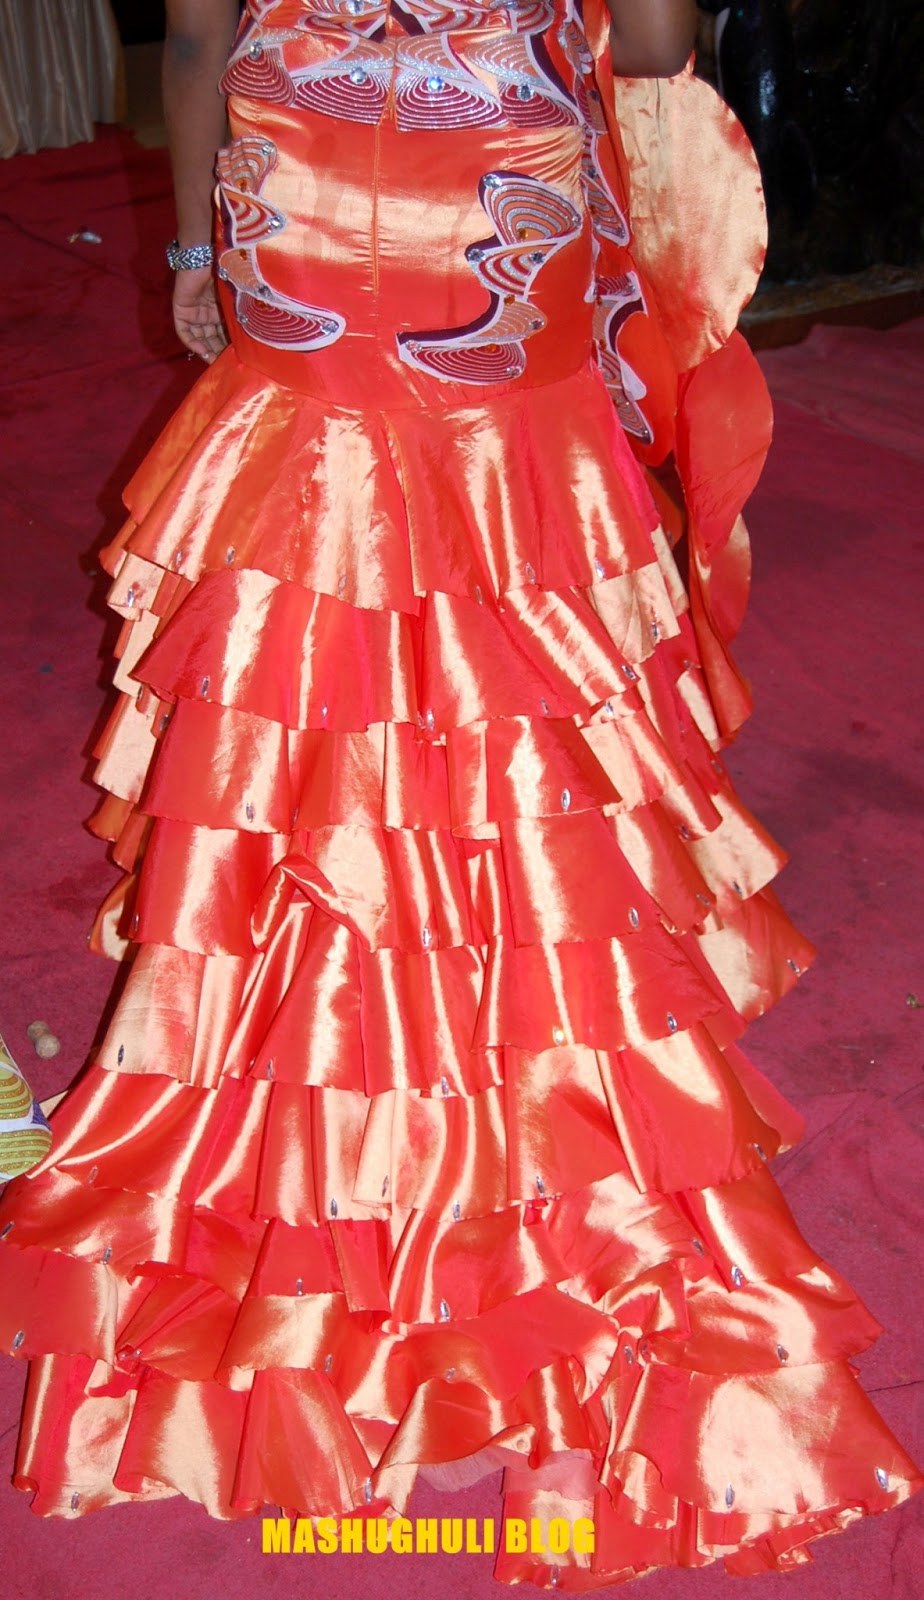 Aziza S Kitchen Party Mashughuli Blog